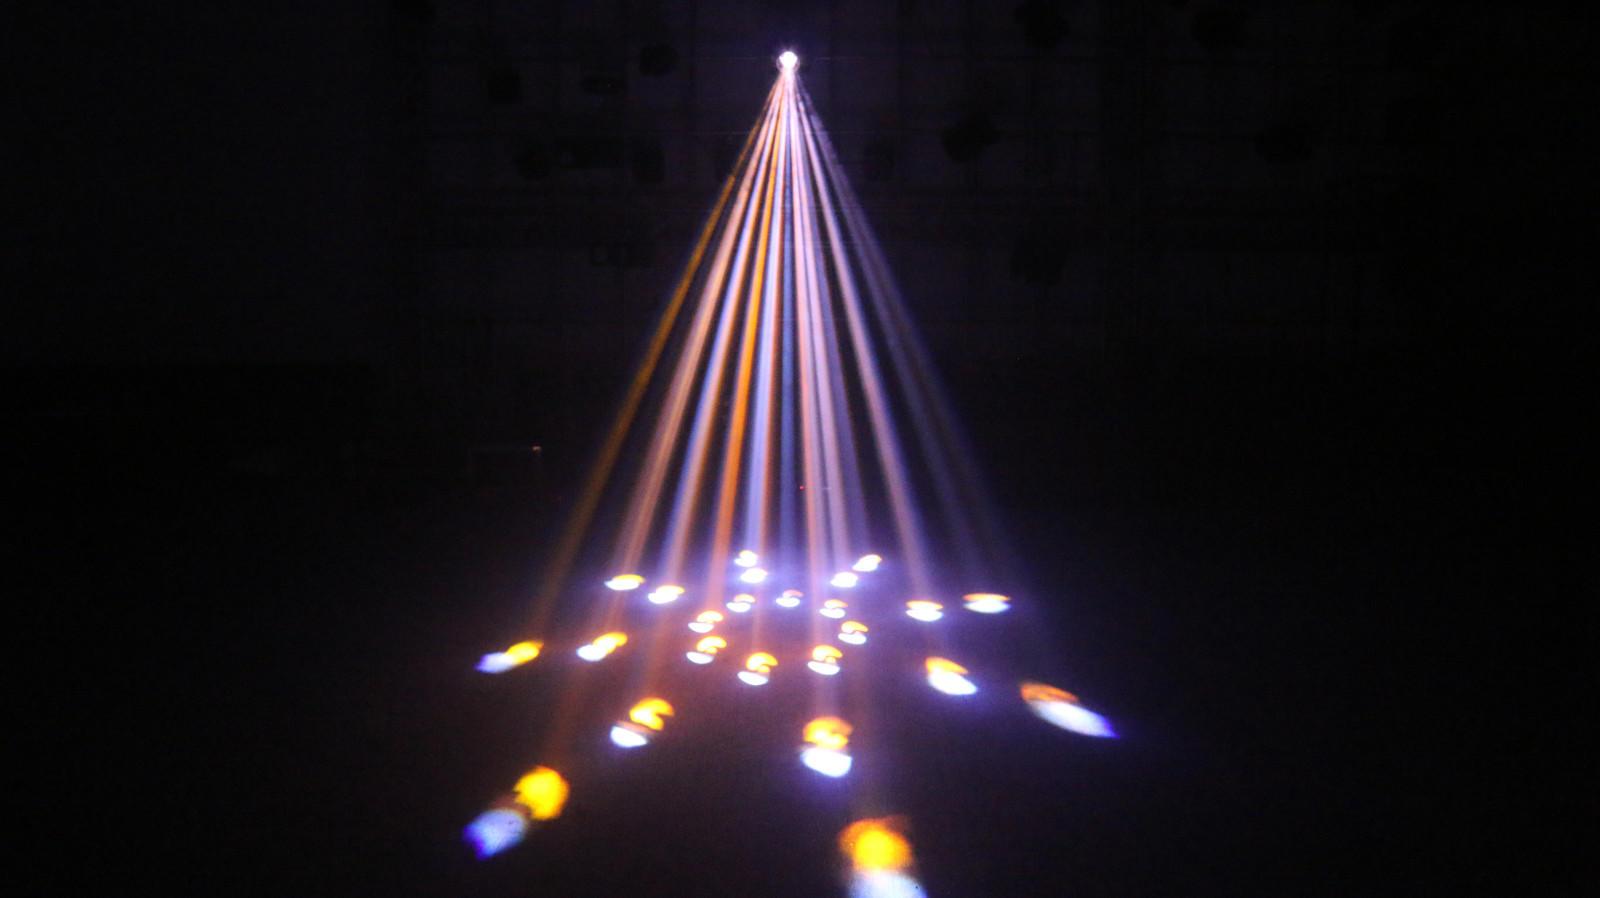 spot beam light to decorative for band Marslite